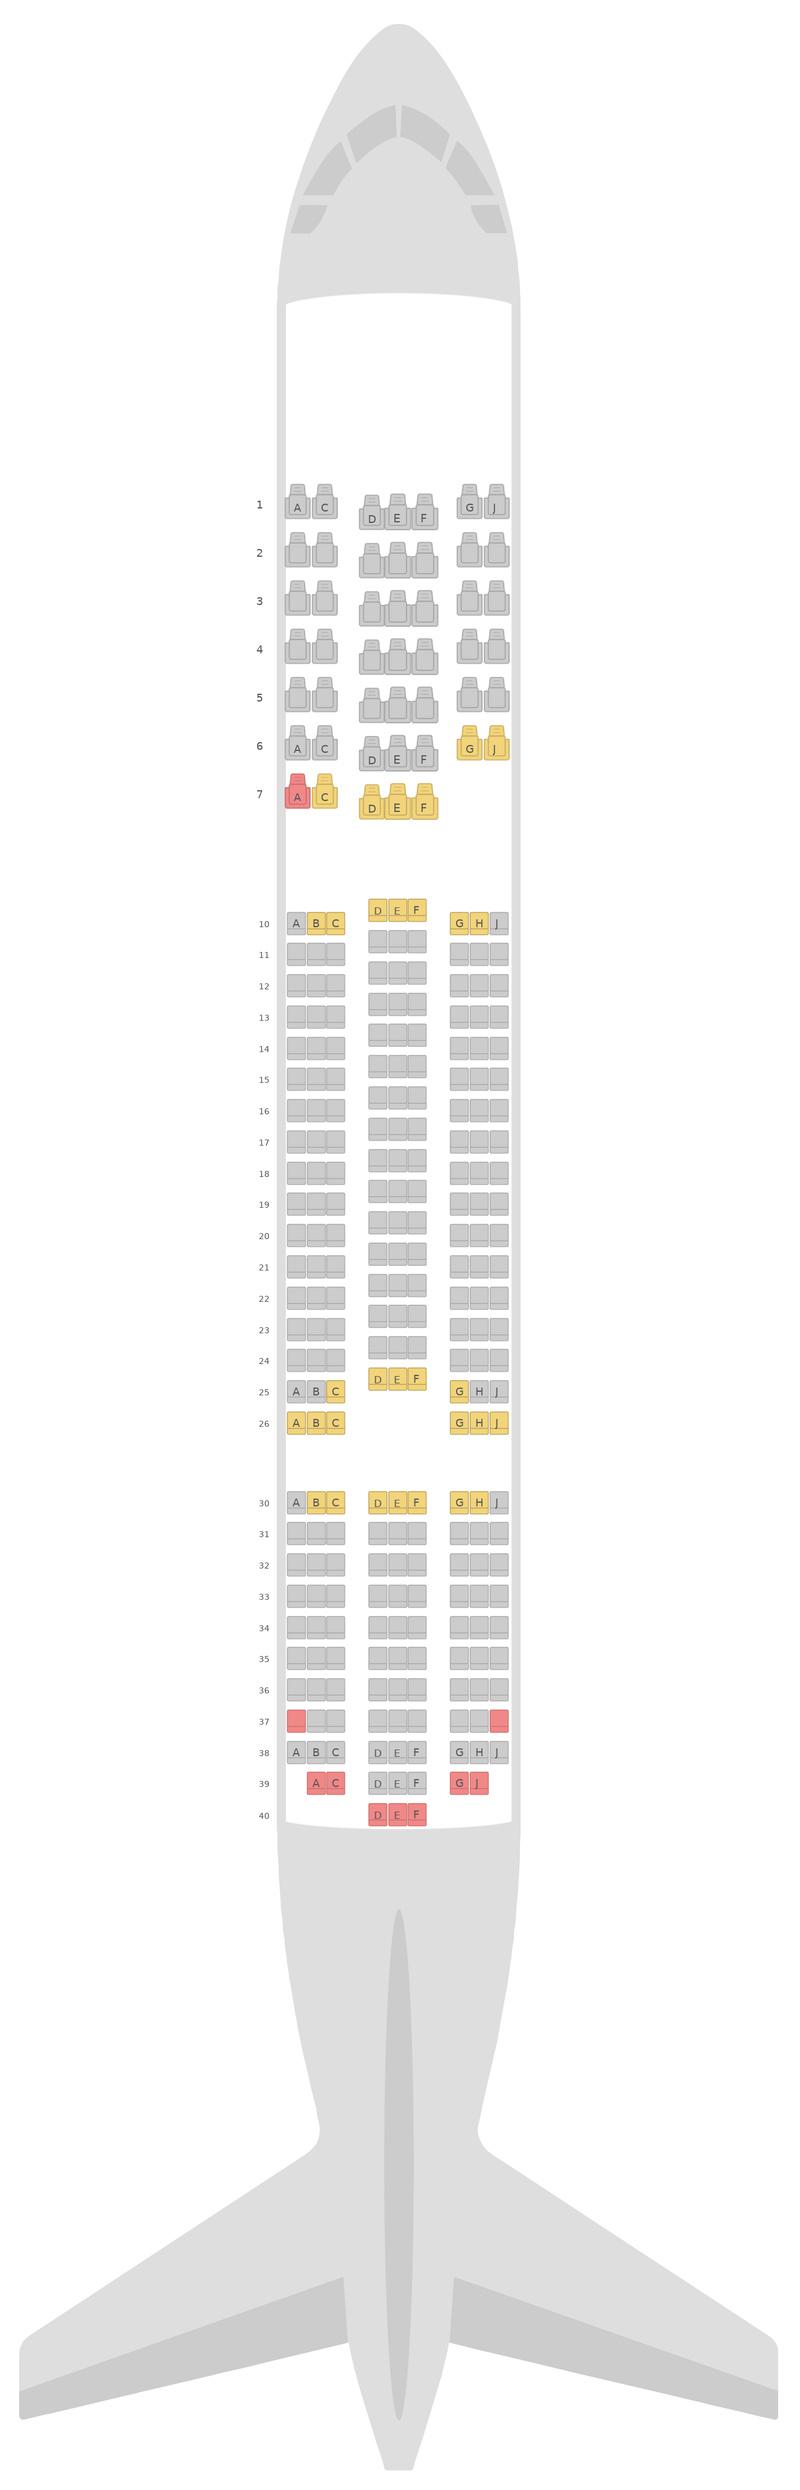 Mapa de asientos Boeing 787-8 (788) TUI Airways